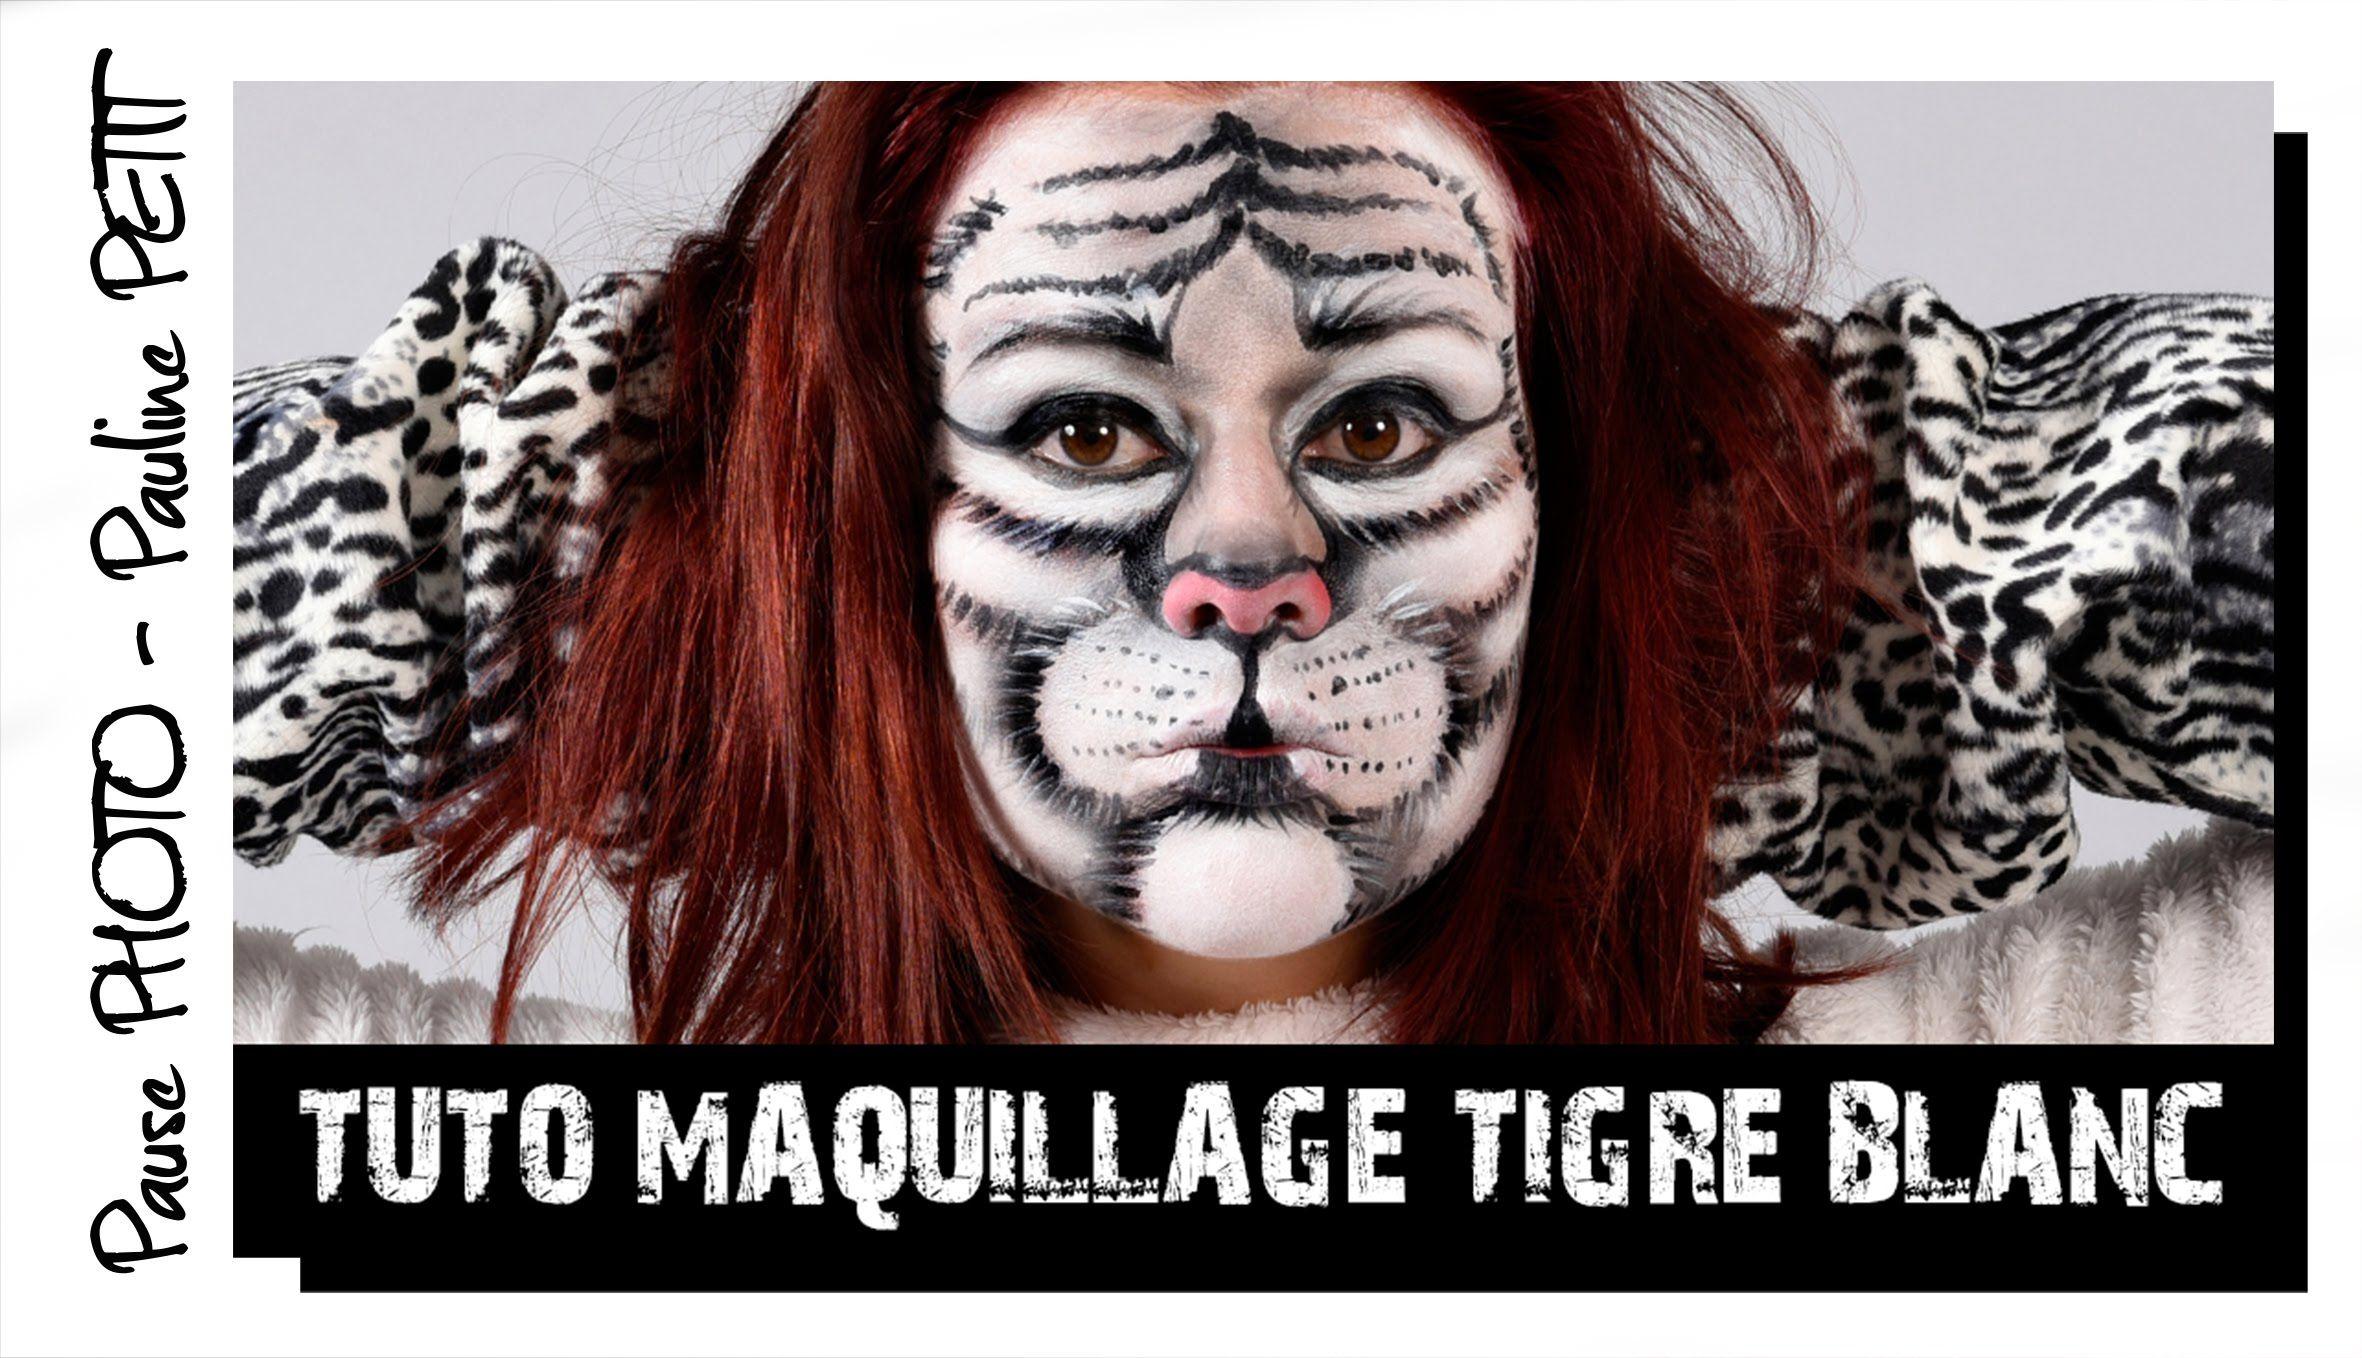 [ TUTO MAQUILLAGE n°1 ] Maquillage Tigre Blanc / White Tiger Makeup